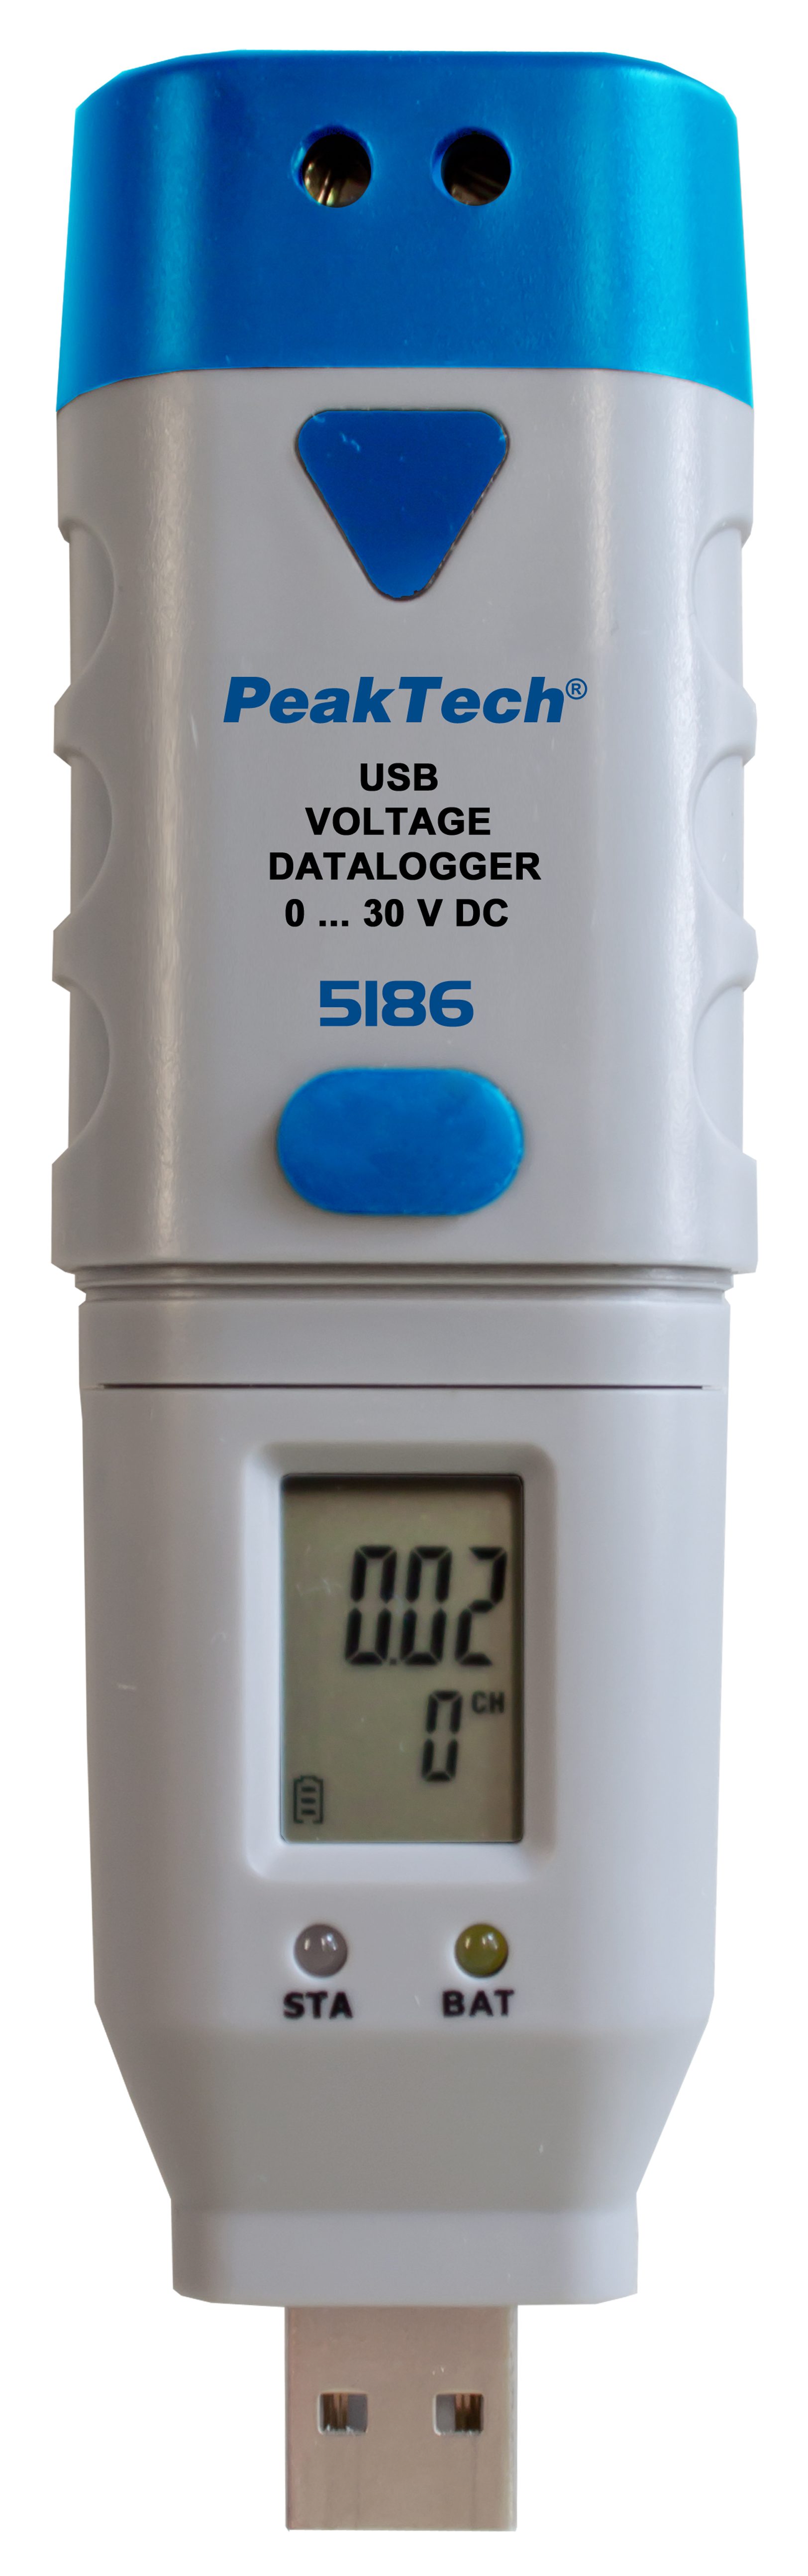 «PeakTech® P 5186» USB-Datalogger Voltage: 0 … 30V DC